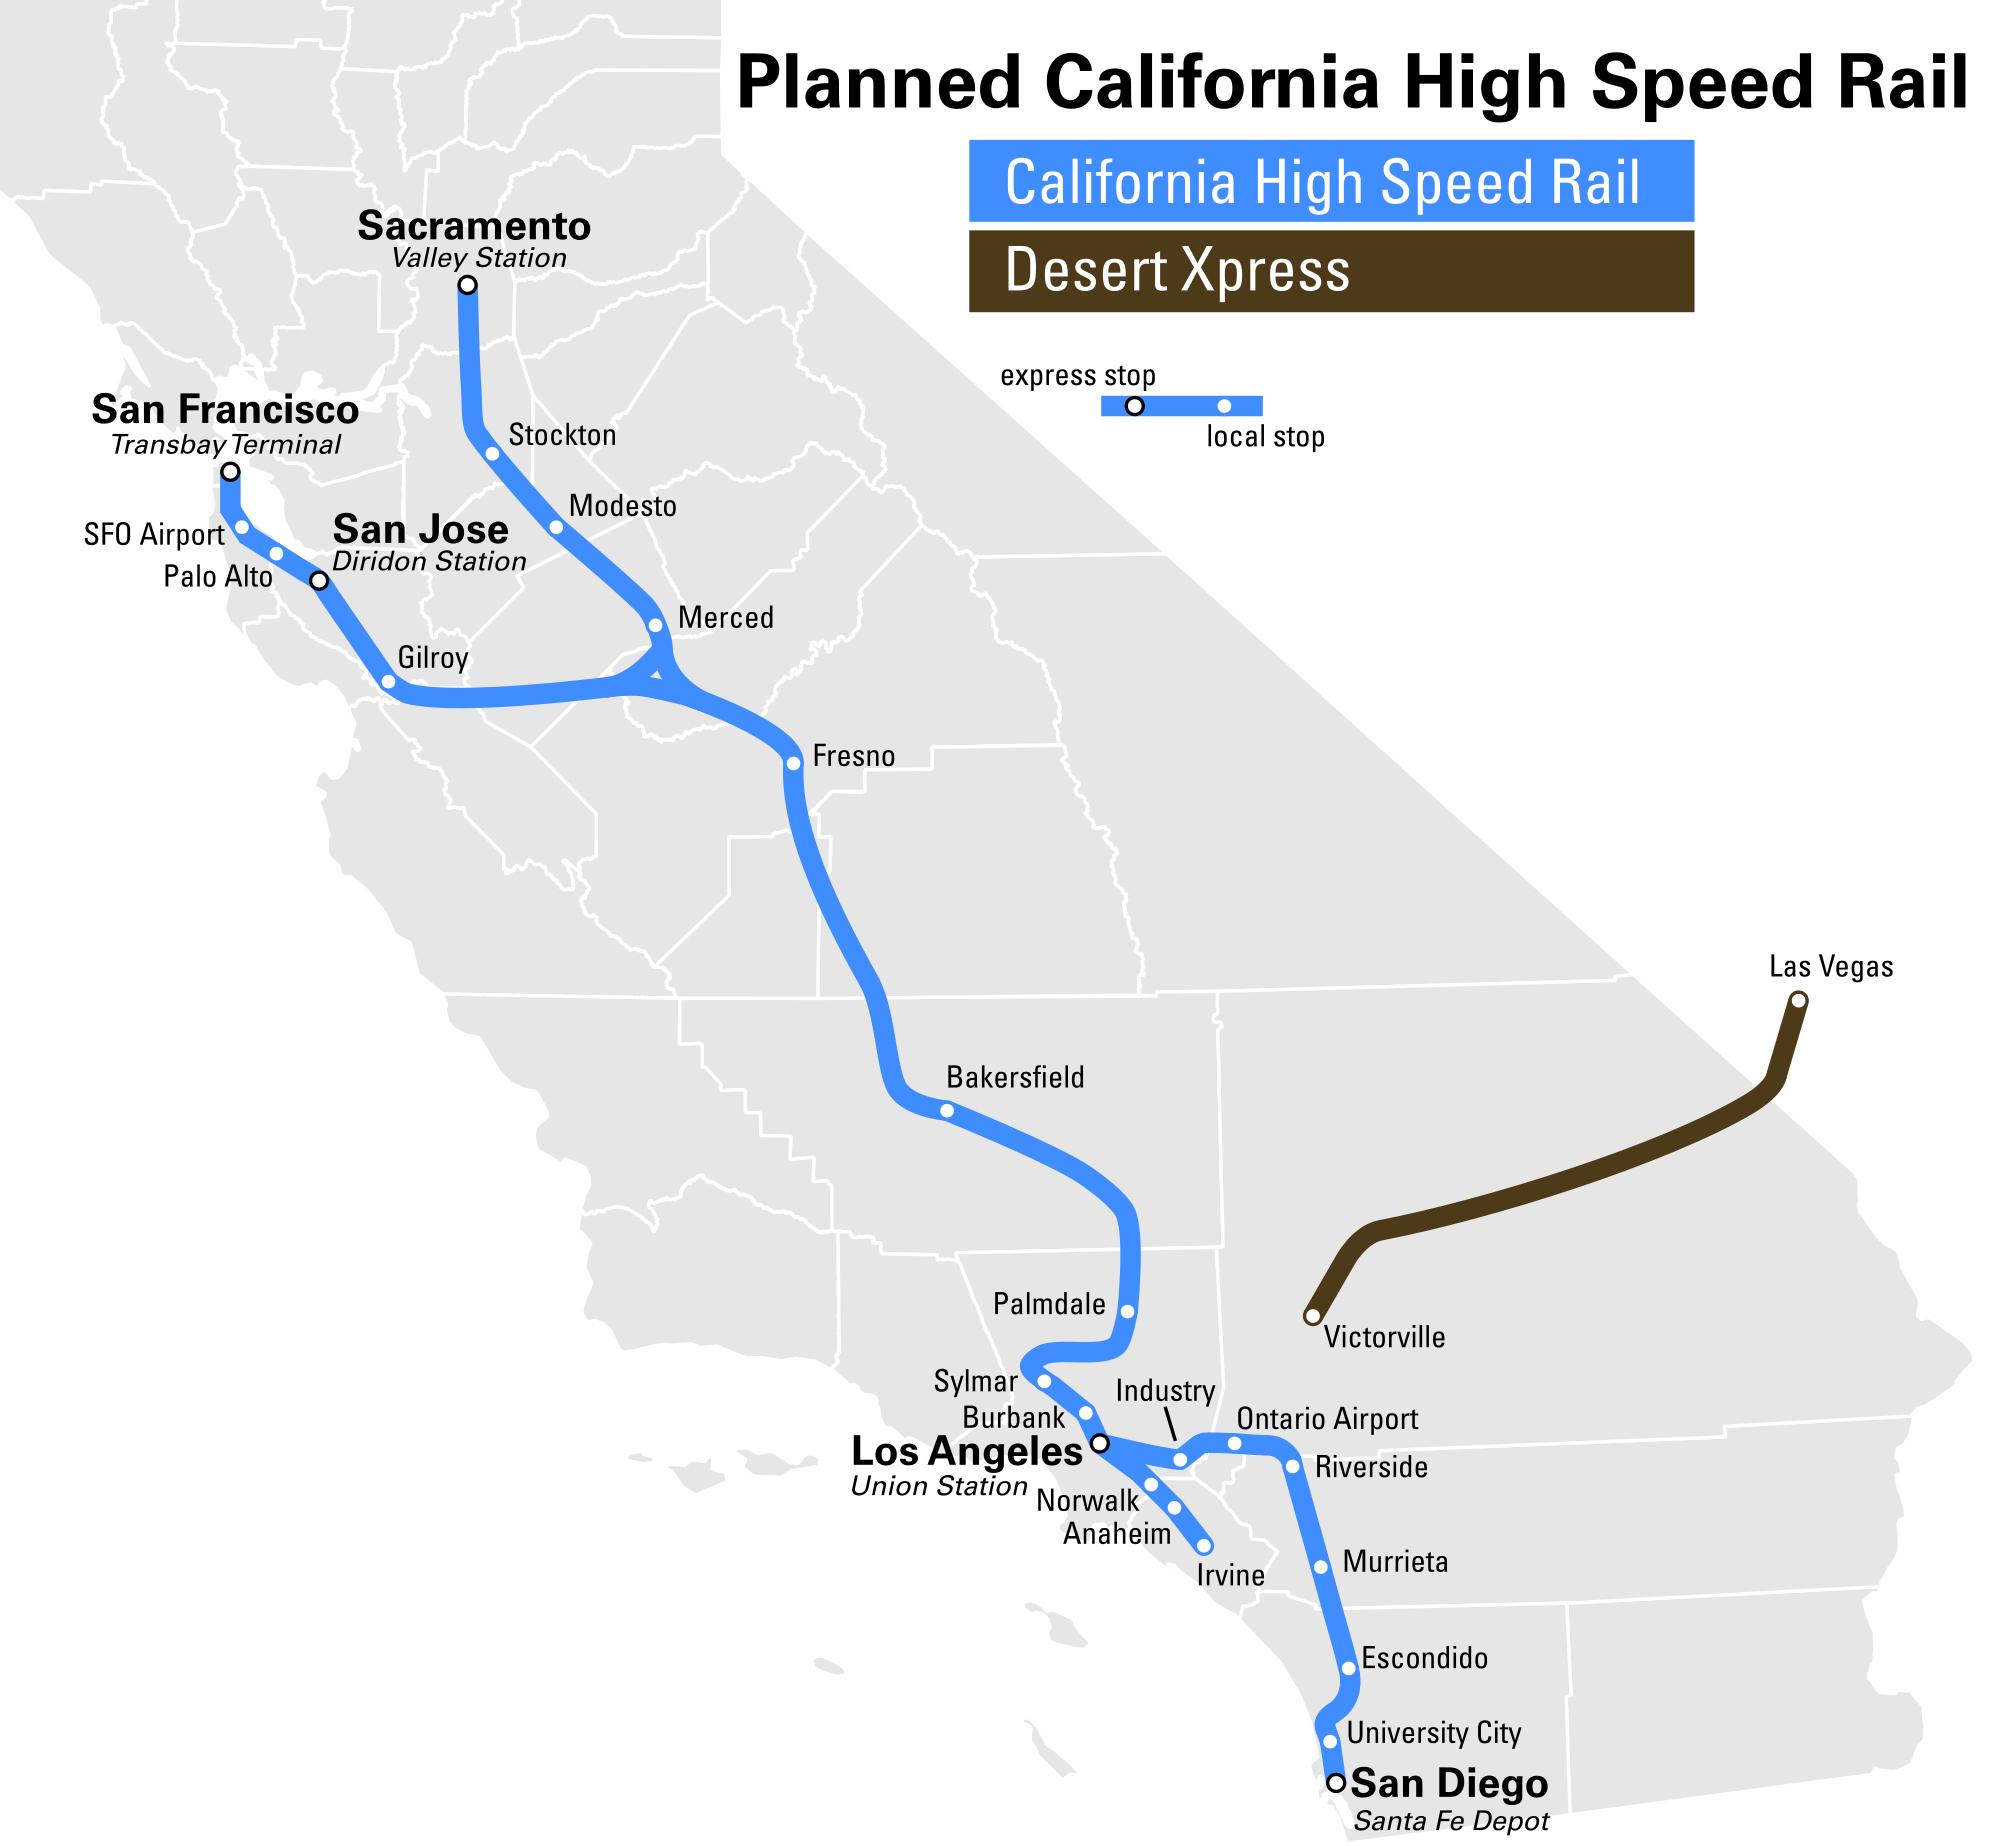 Xpresswest High Speed Rail California State Map High Speed Rail Map - California High Speed Rail Map